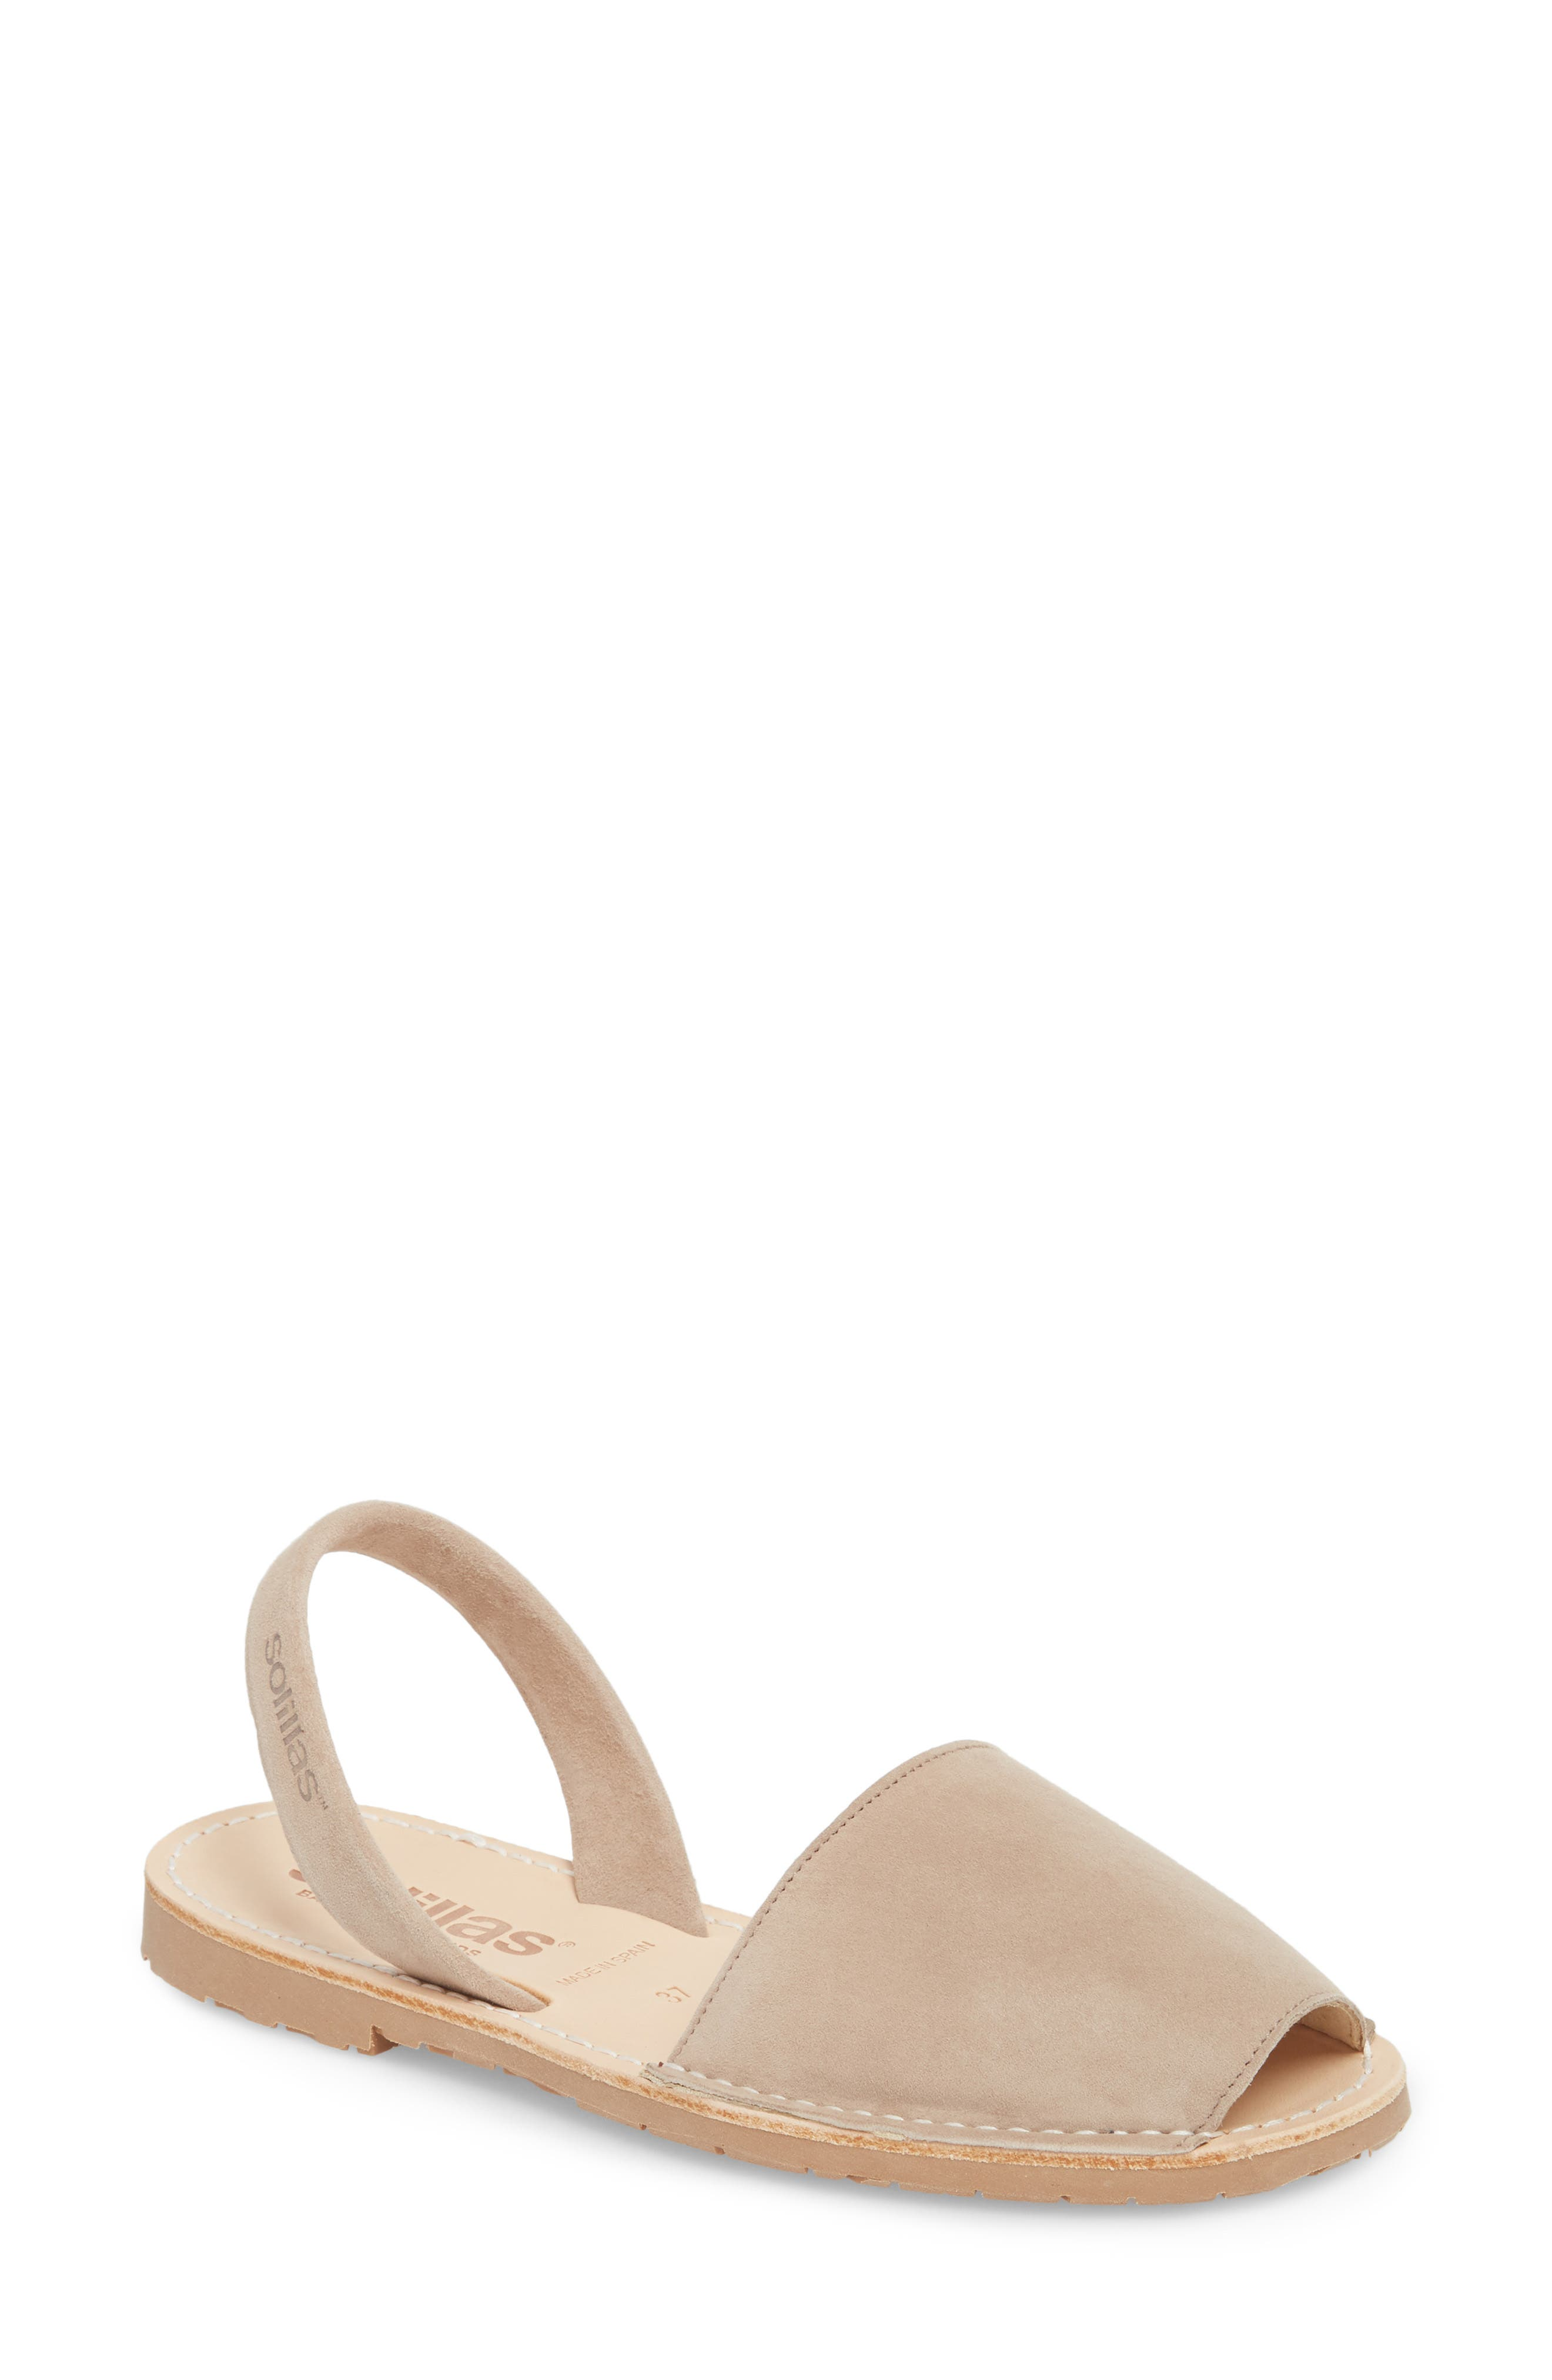 SOLILLAS Flat Sandal, Main, color, TAUPE